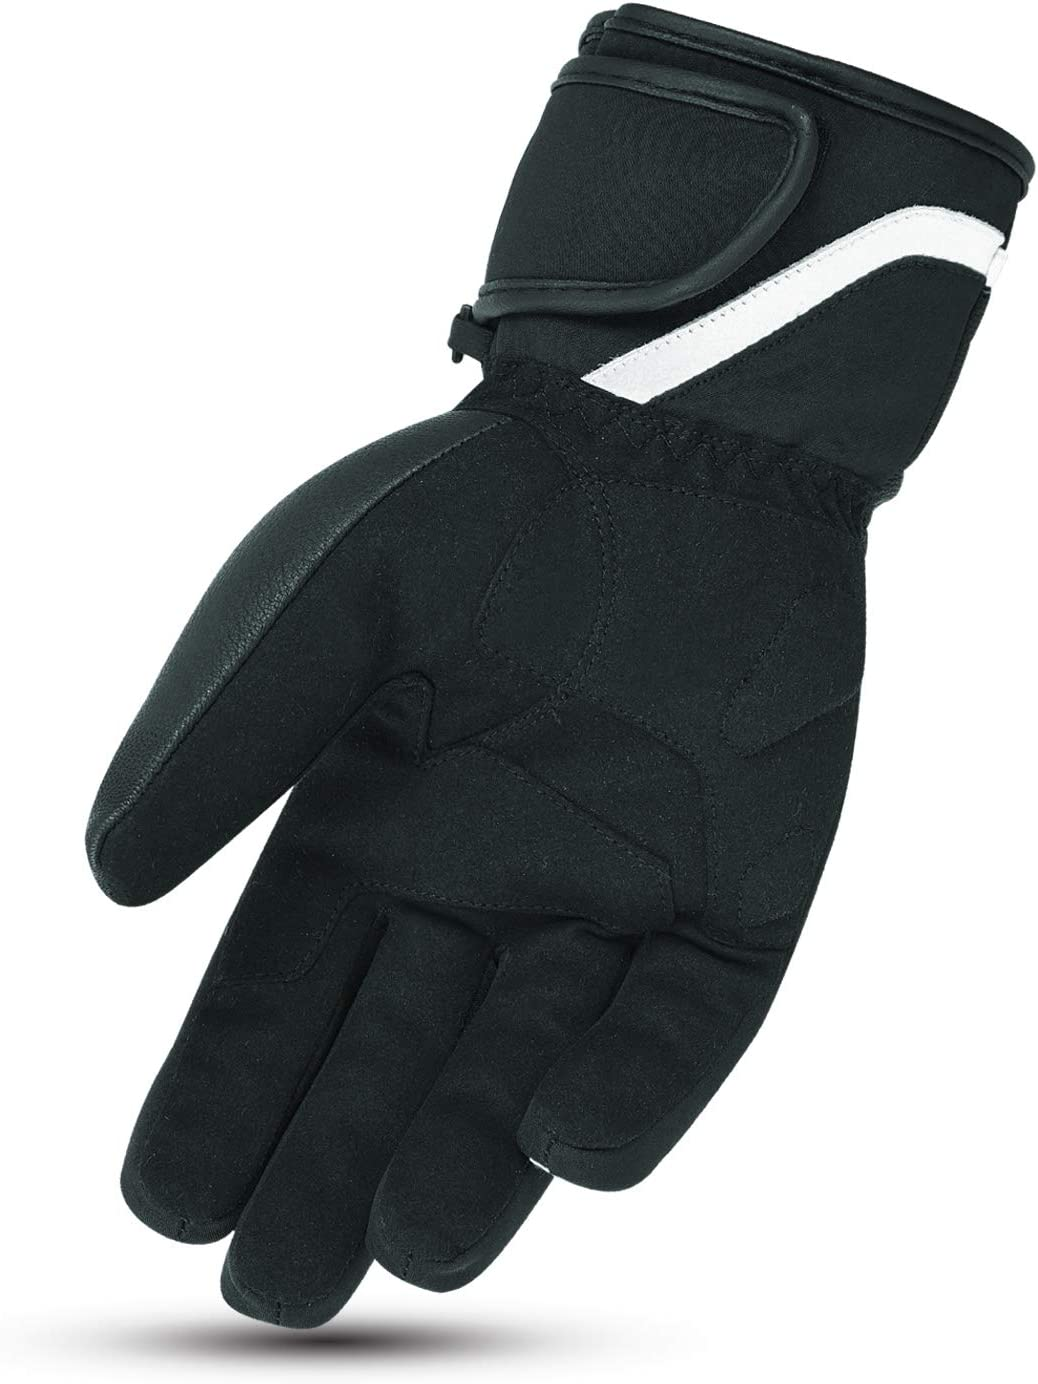 XS, Wei/ß Jet Motorradhandschuhe Winter Wasserdicht Leder Textil Kn/öchelschutz PROTEX